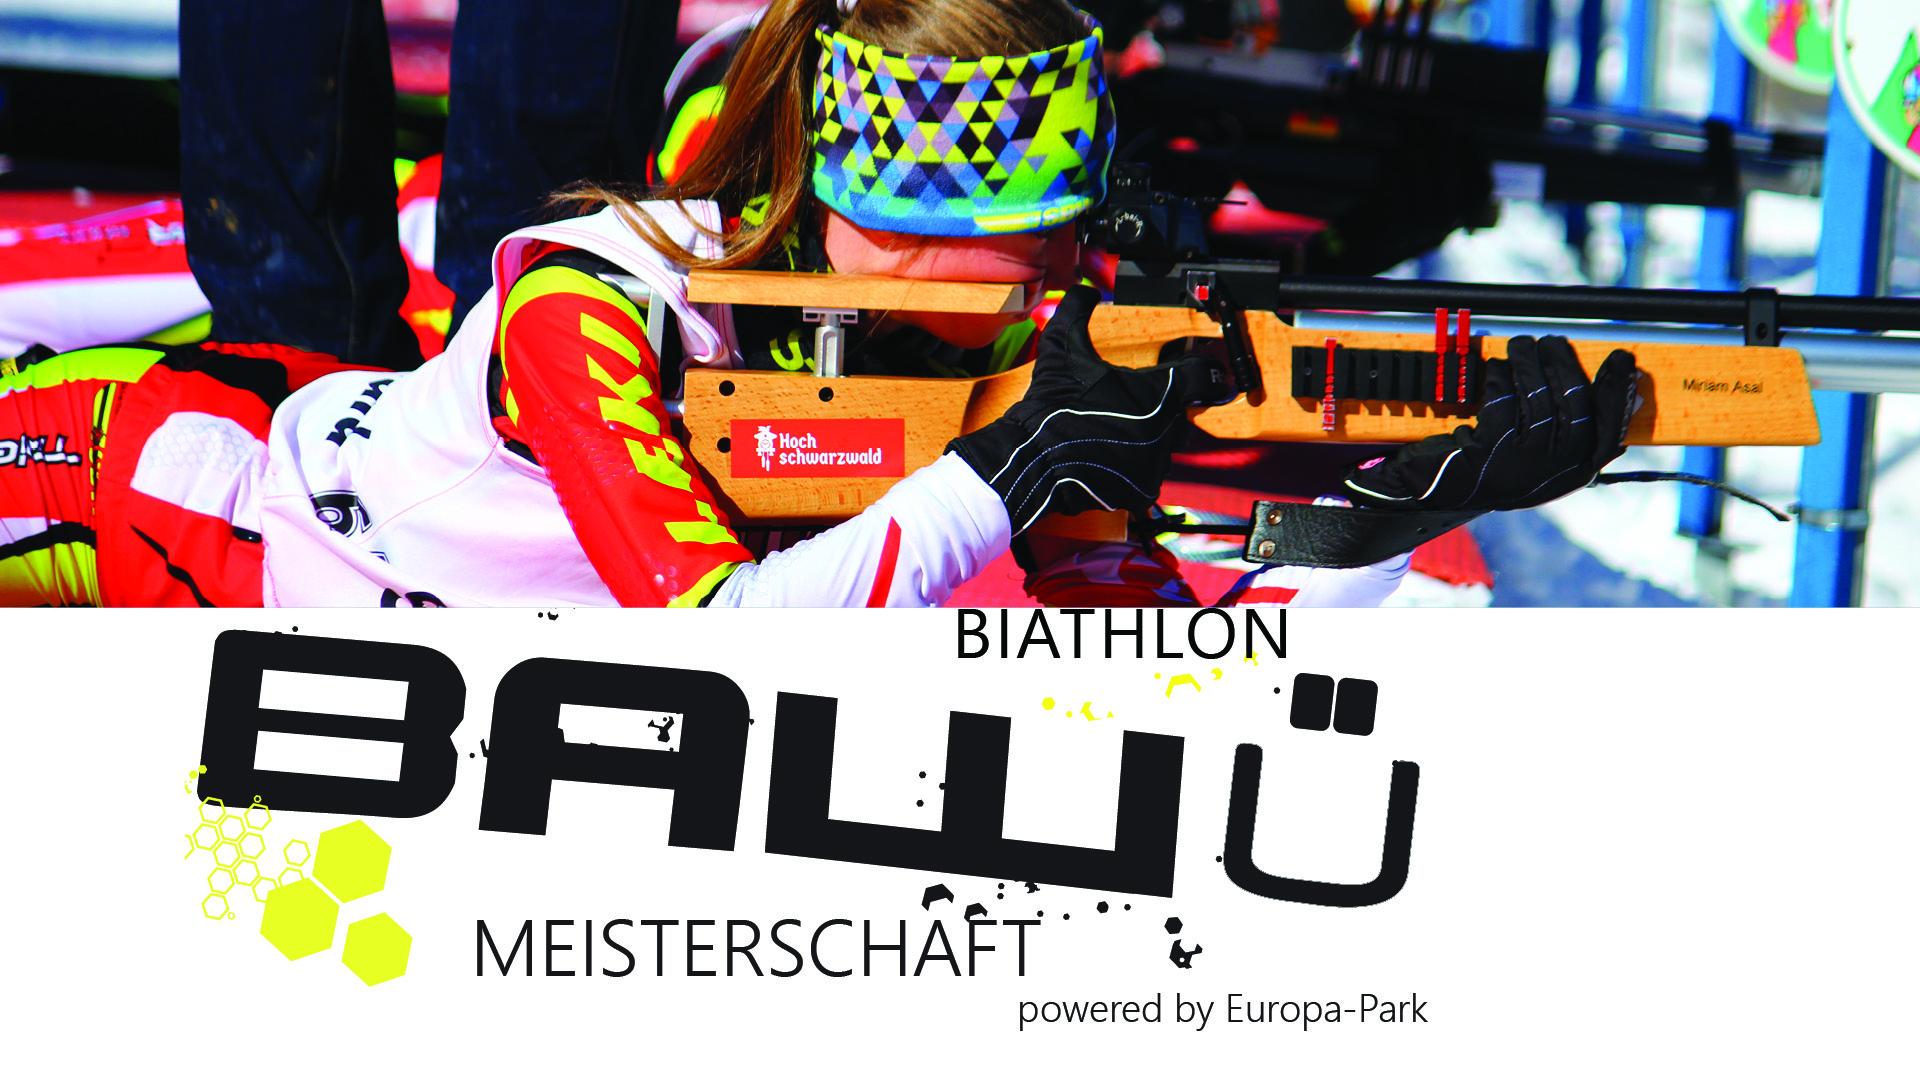 Ba-Wü Meisterschaften Biathlon